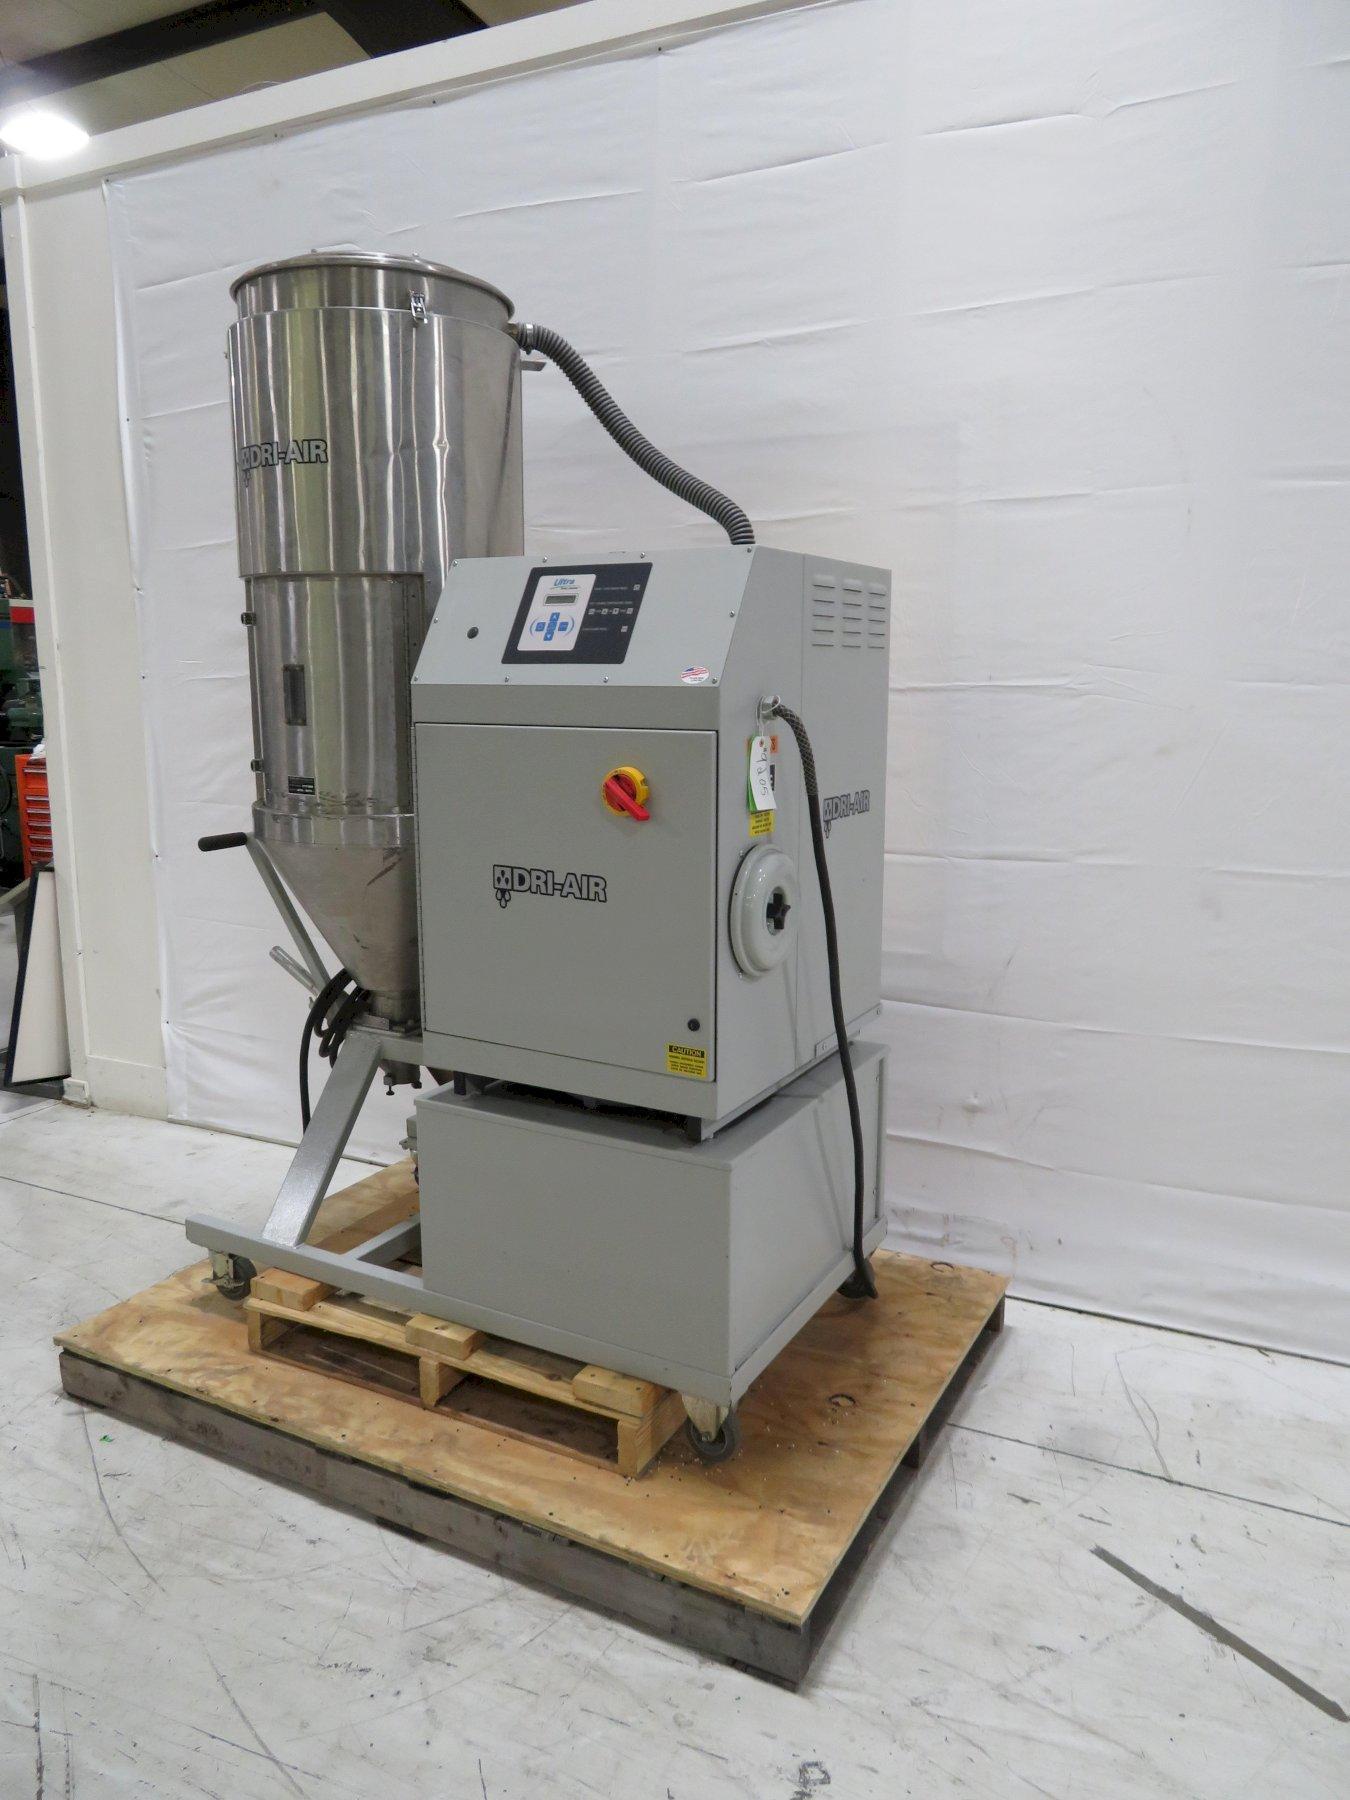 Dri-Air Used APD-8 / RH300  Material Dryer, Dessicant, Approx 90 lbs/hr, 230V, Yr. 2015